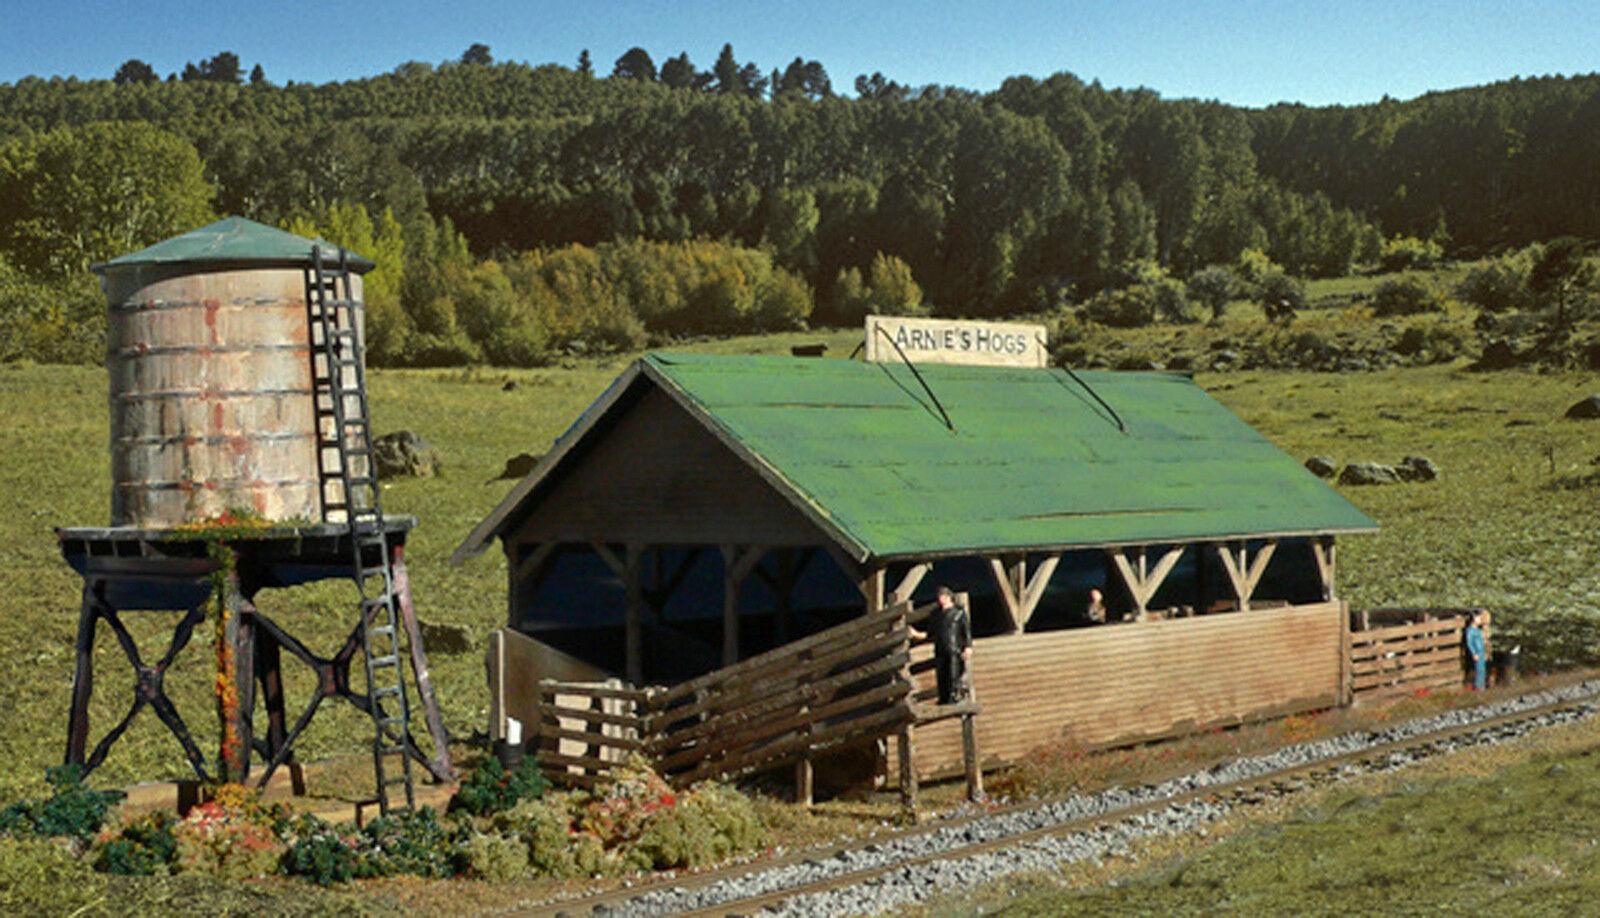 ARNIE'S HOGS HO Model Railroad Laser Structure Farm Building Unptd Kit ALP5809